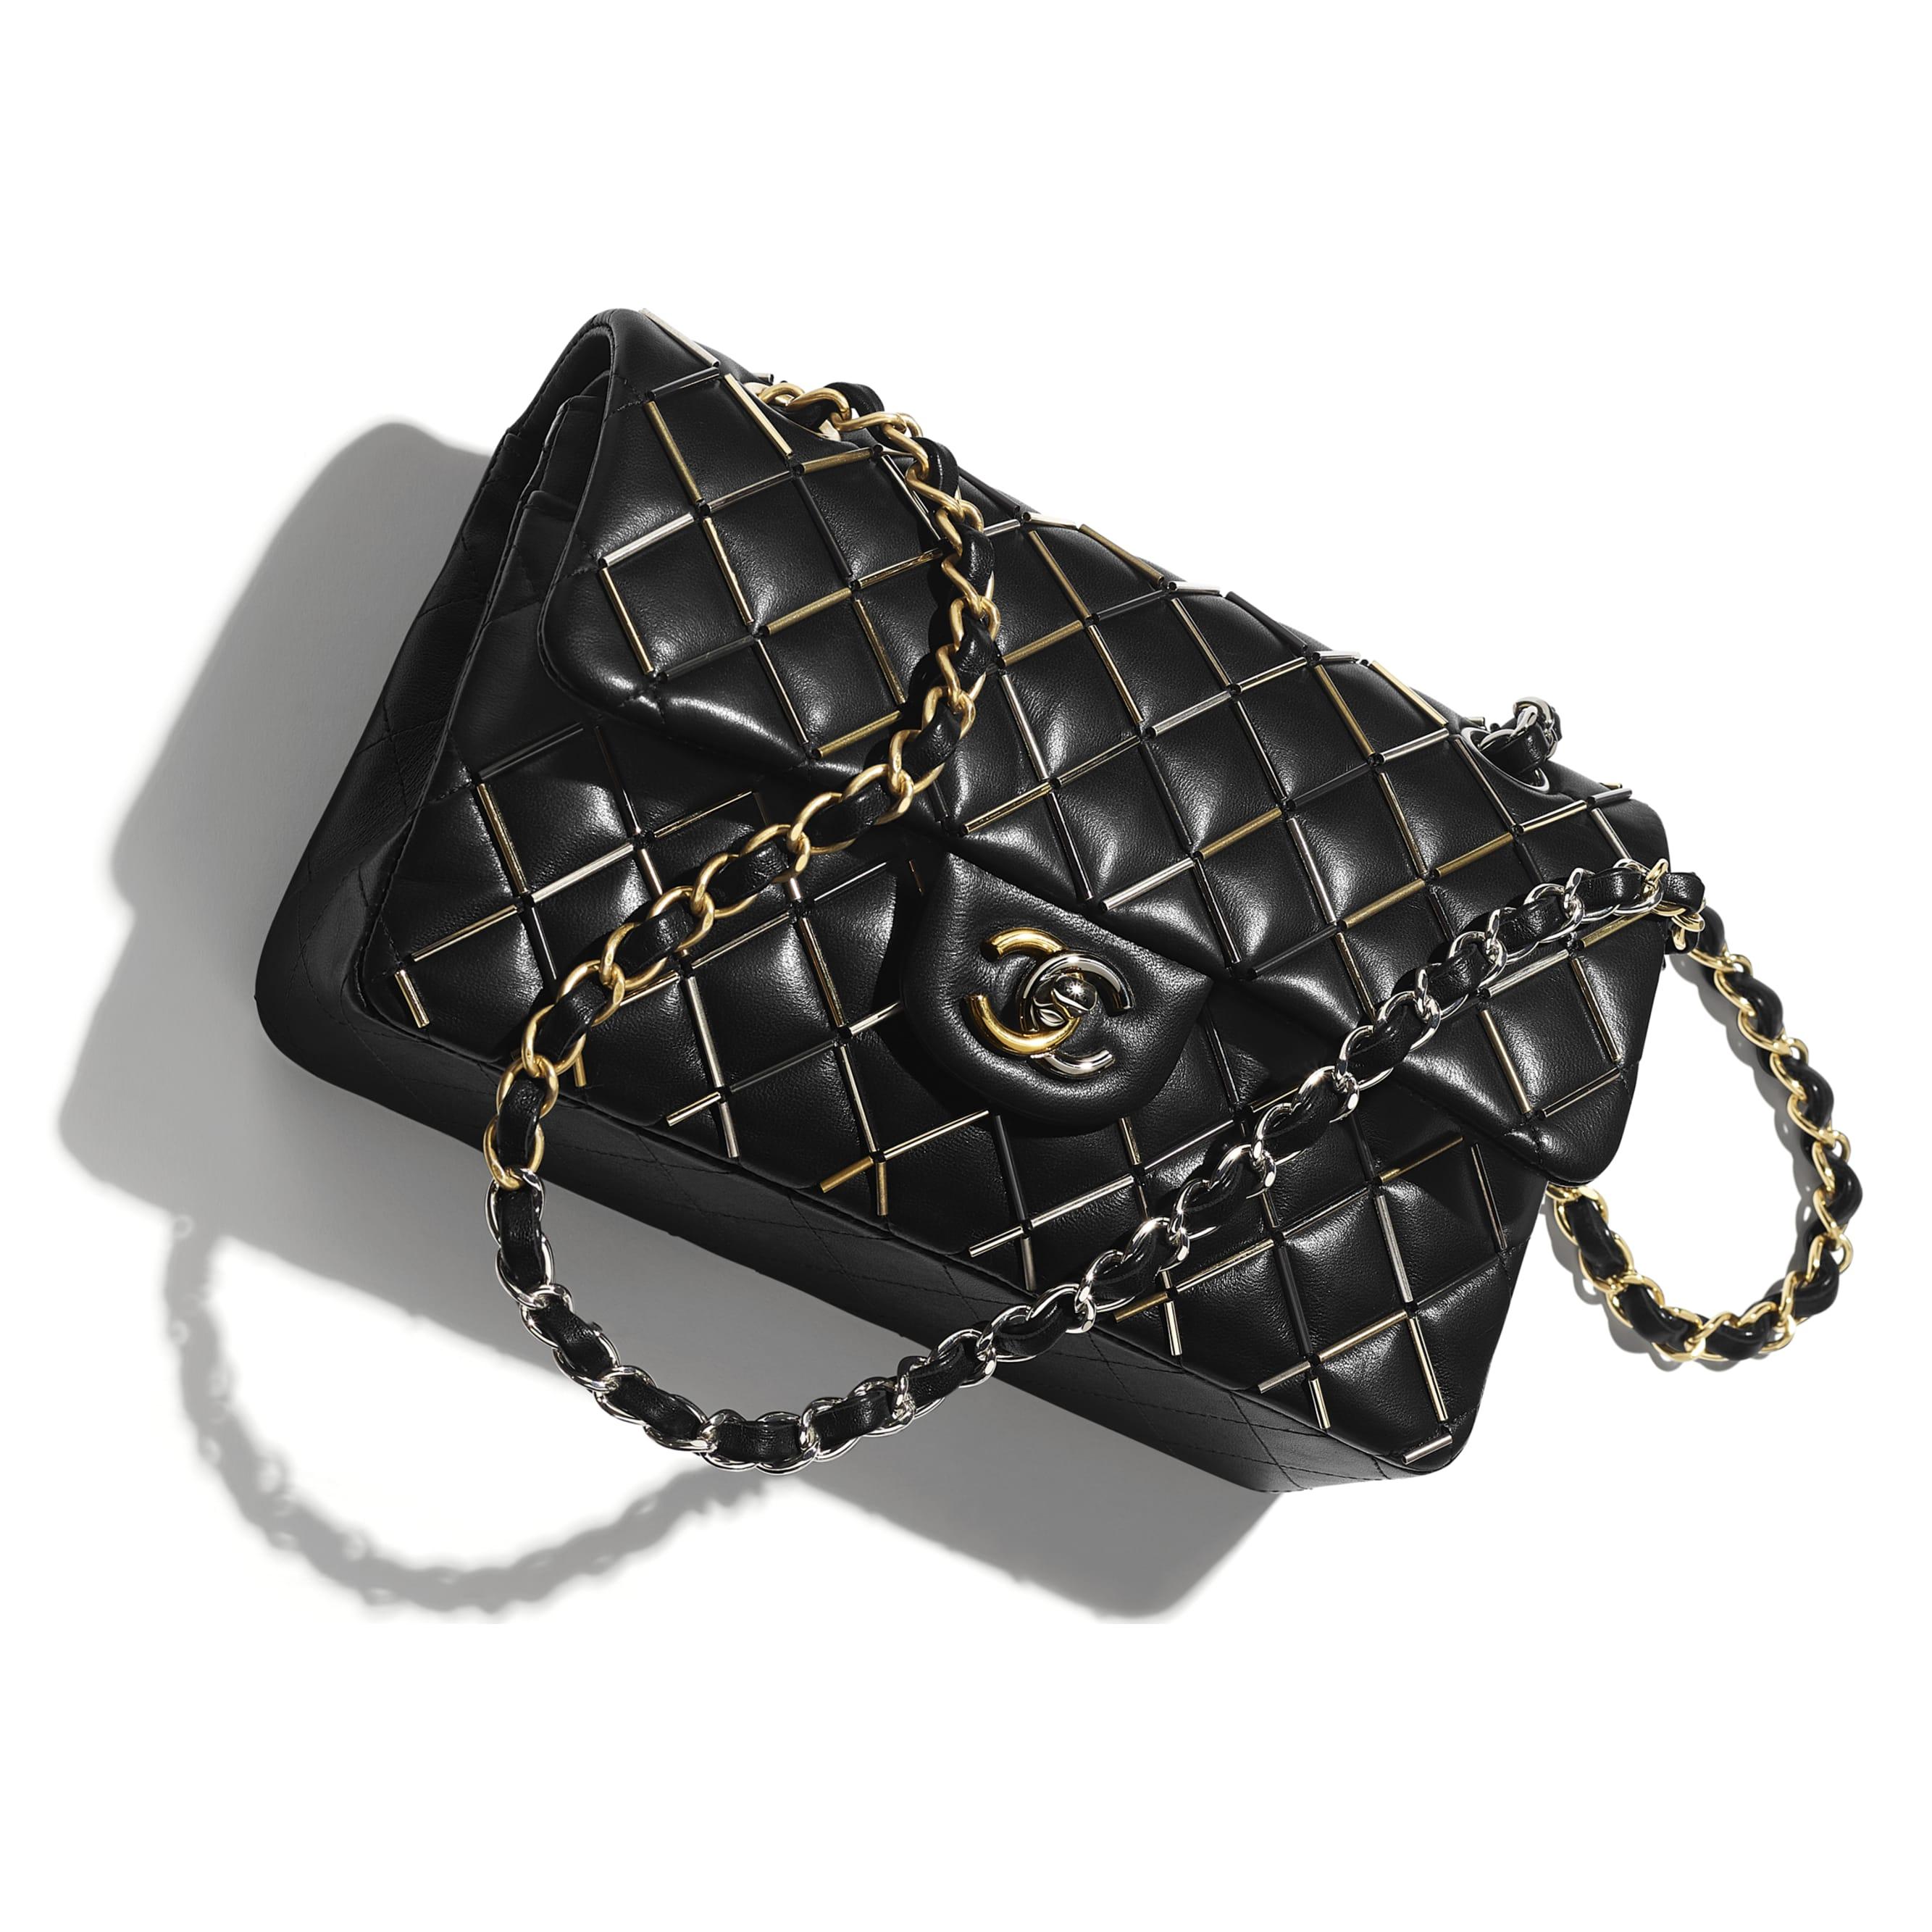 Classic Handbag - Black - Lambskin, Gold-Tone, Silver-Tone, Black & Ruthenium-Finish Metal  - Extra view - see standard sized version